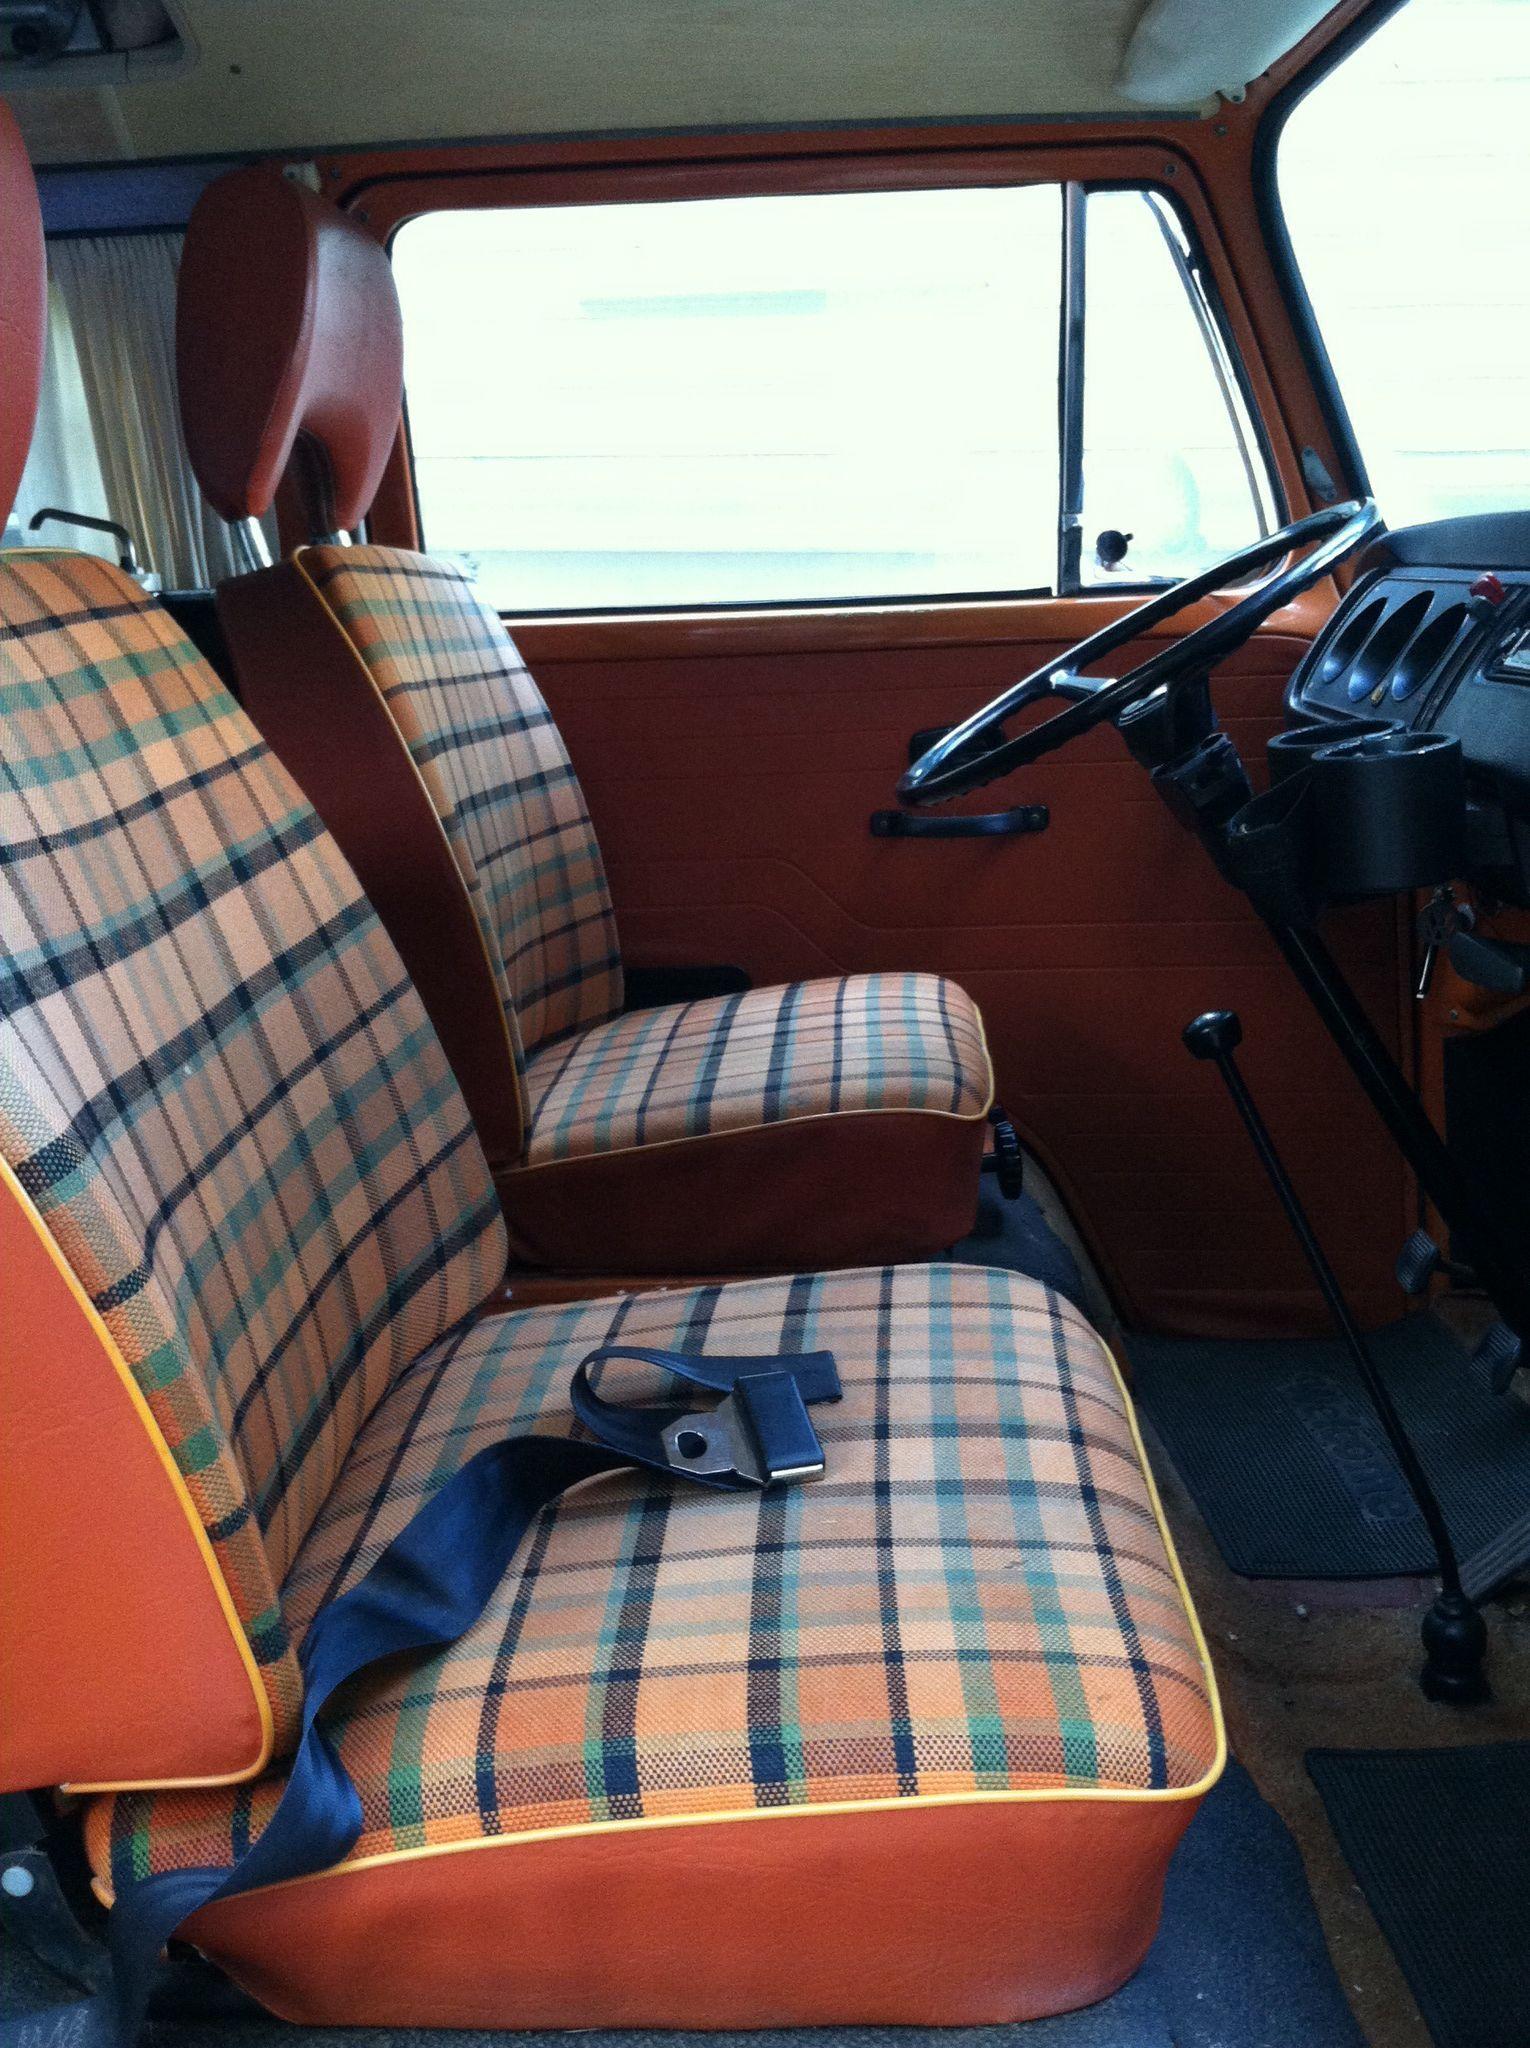 1974 westfalia camper van interior yesss 74 westfalia is where its at